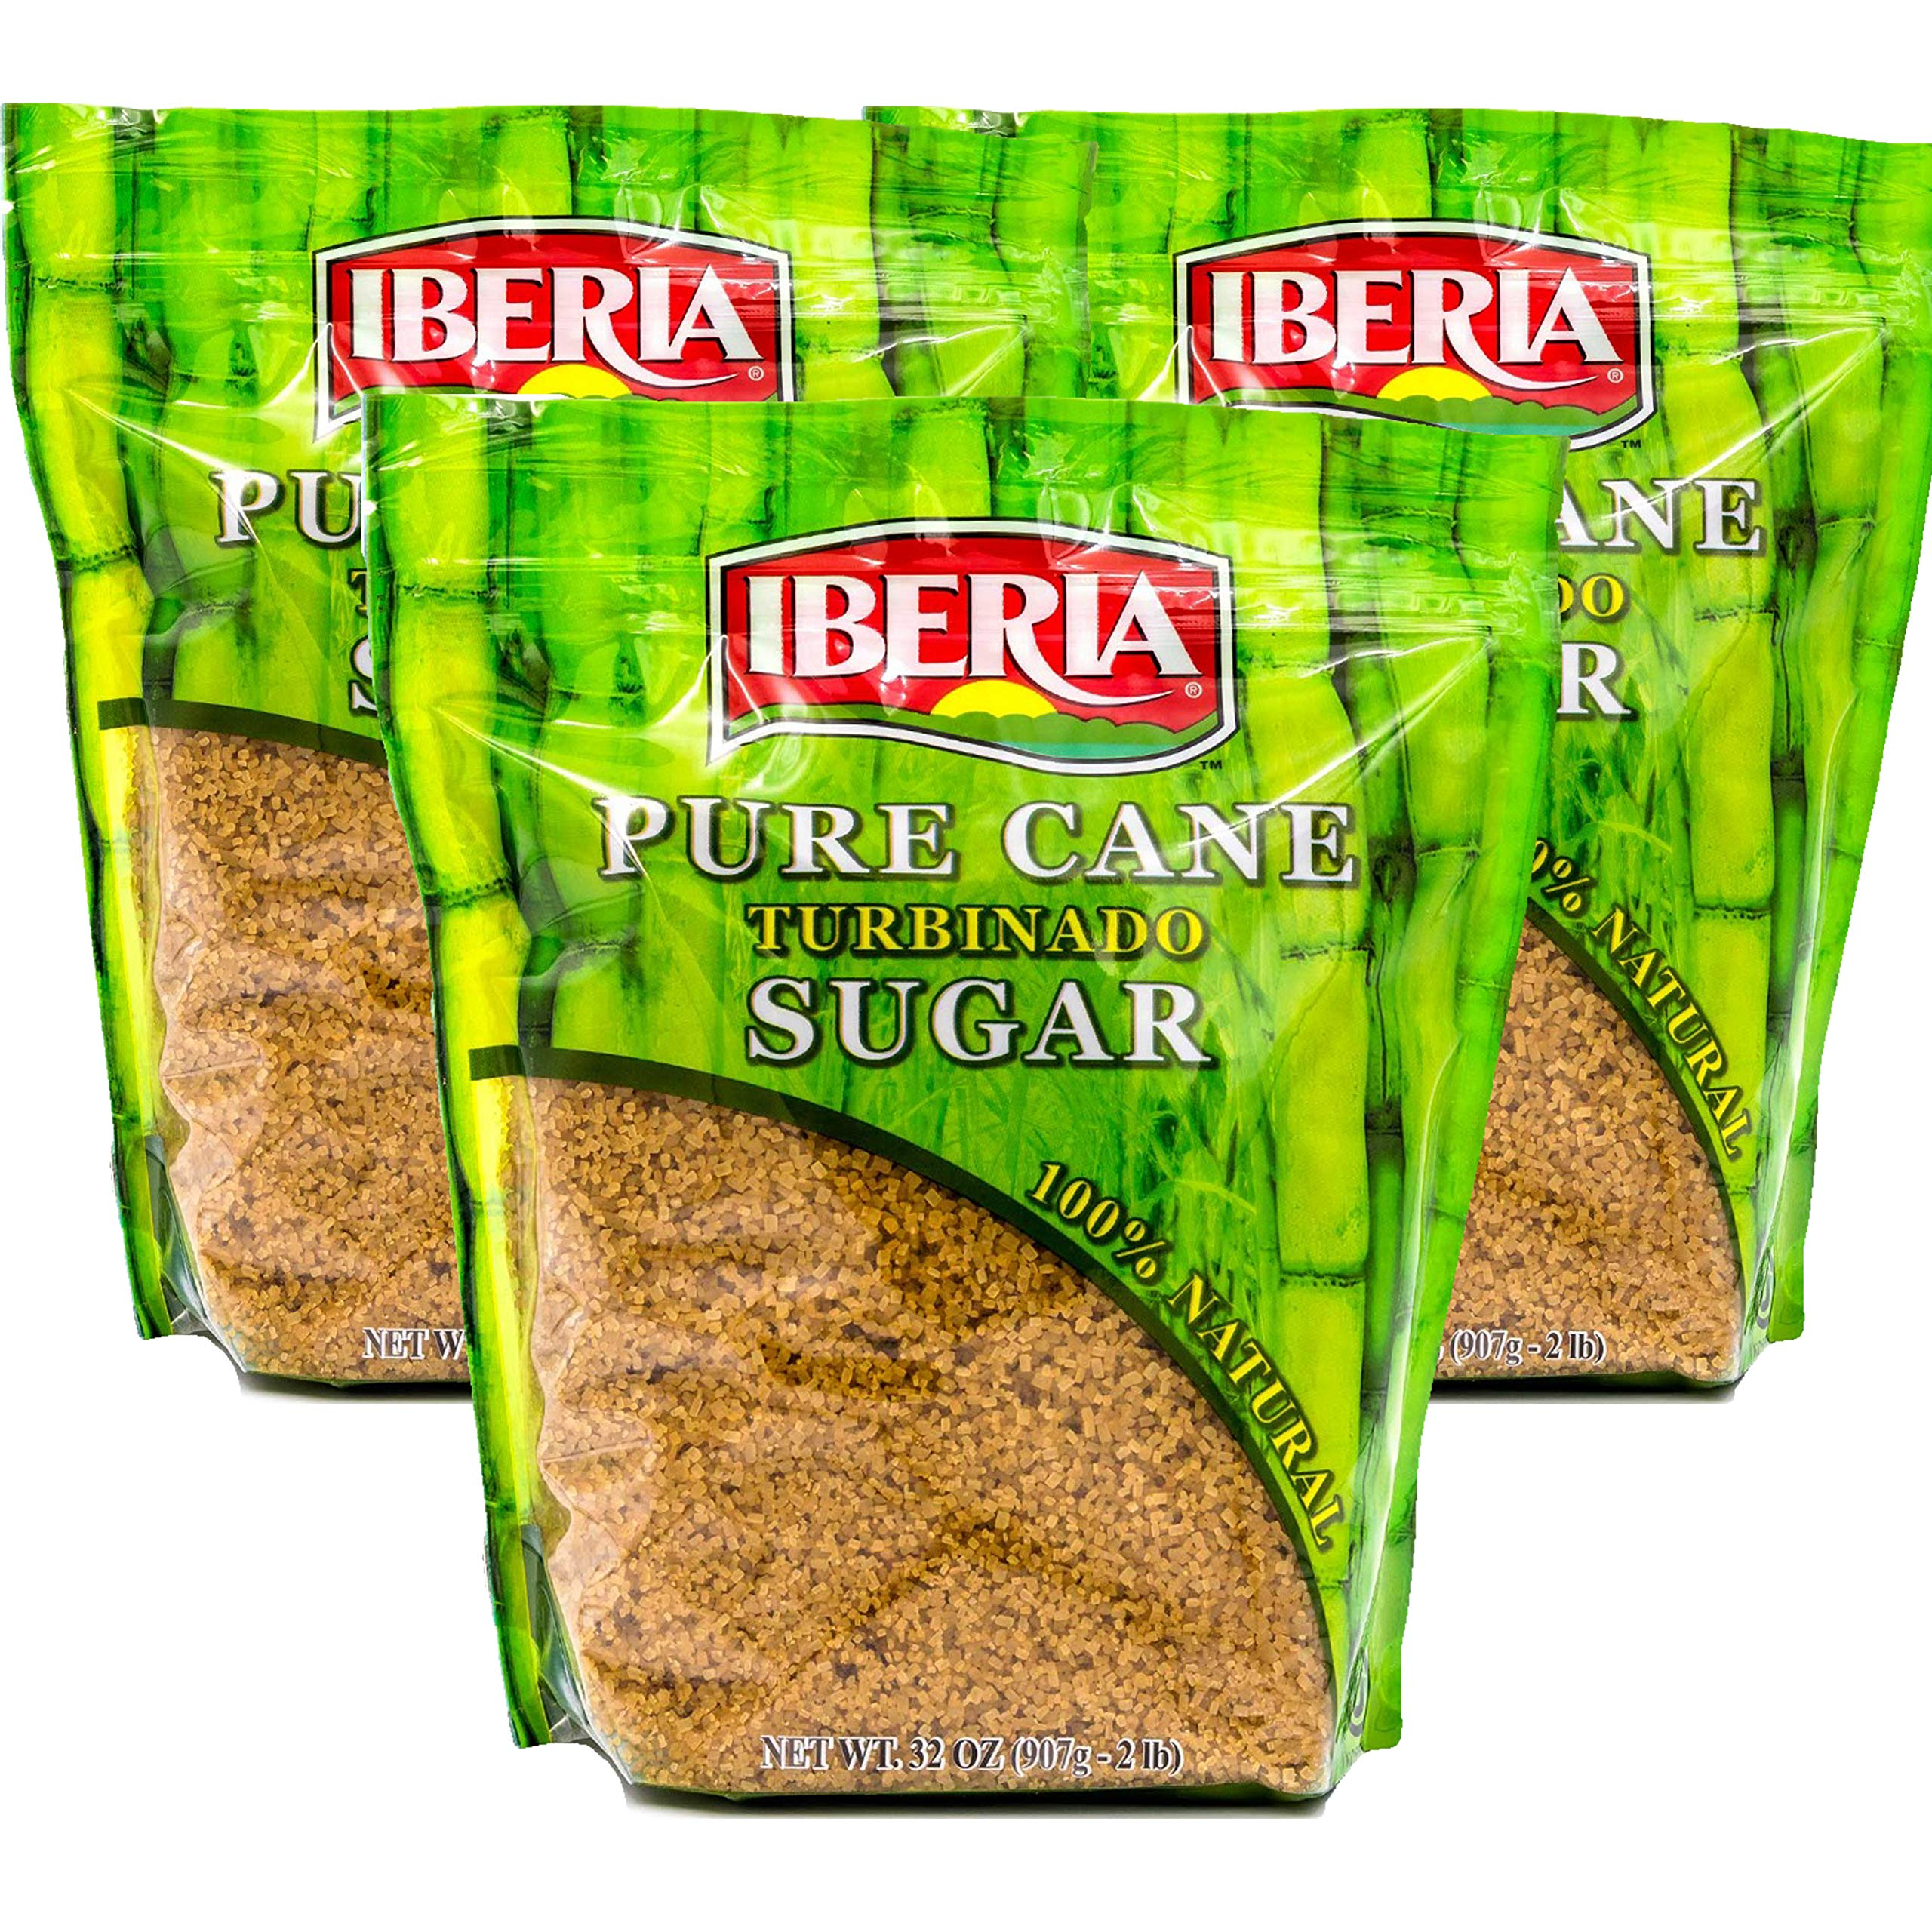 Iberia Turbinado Sugar 2 Lb. (Pack Of 03) Sparkling Golden Pure Raw Cane Turbinado Sugar Bulk, 3 Individual Resealable 2 Lb. Bags by IBERIA